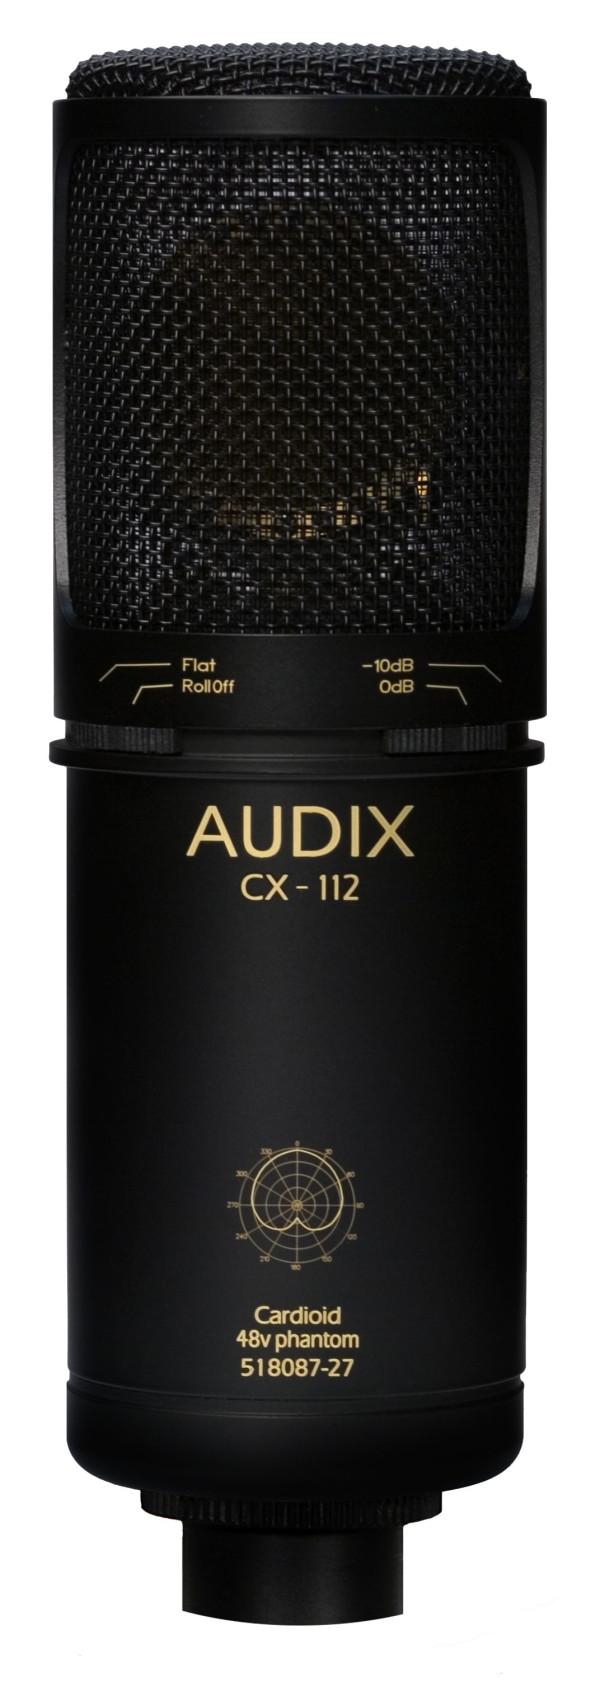 Audix CX-112 condensor microfoon